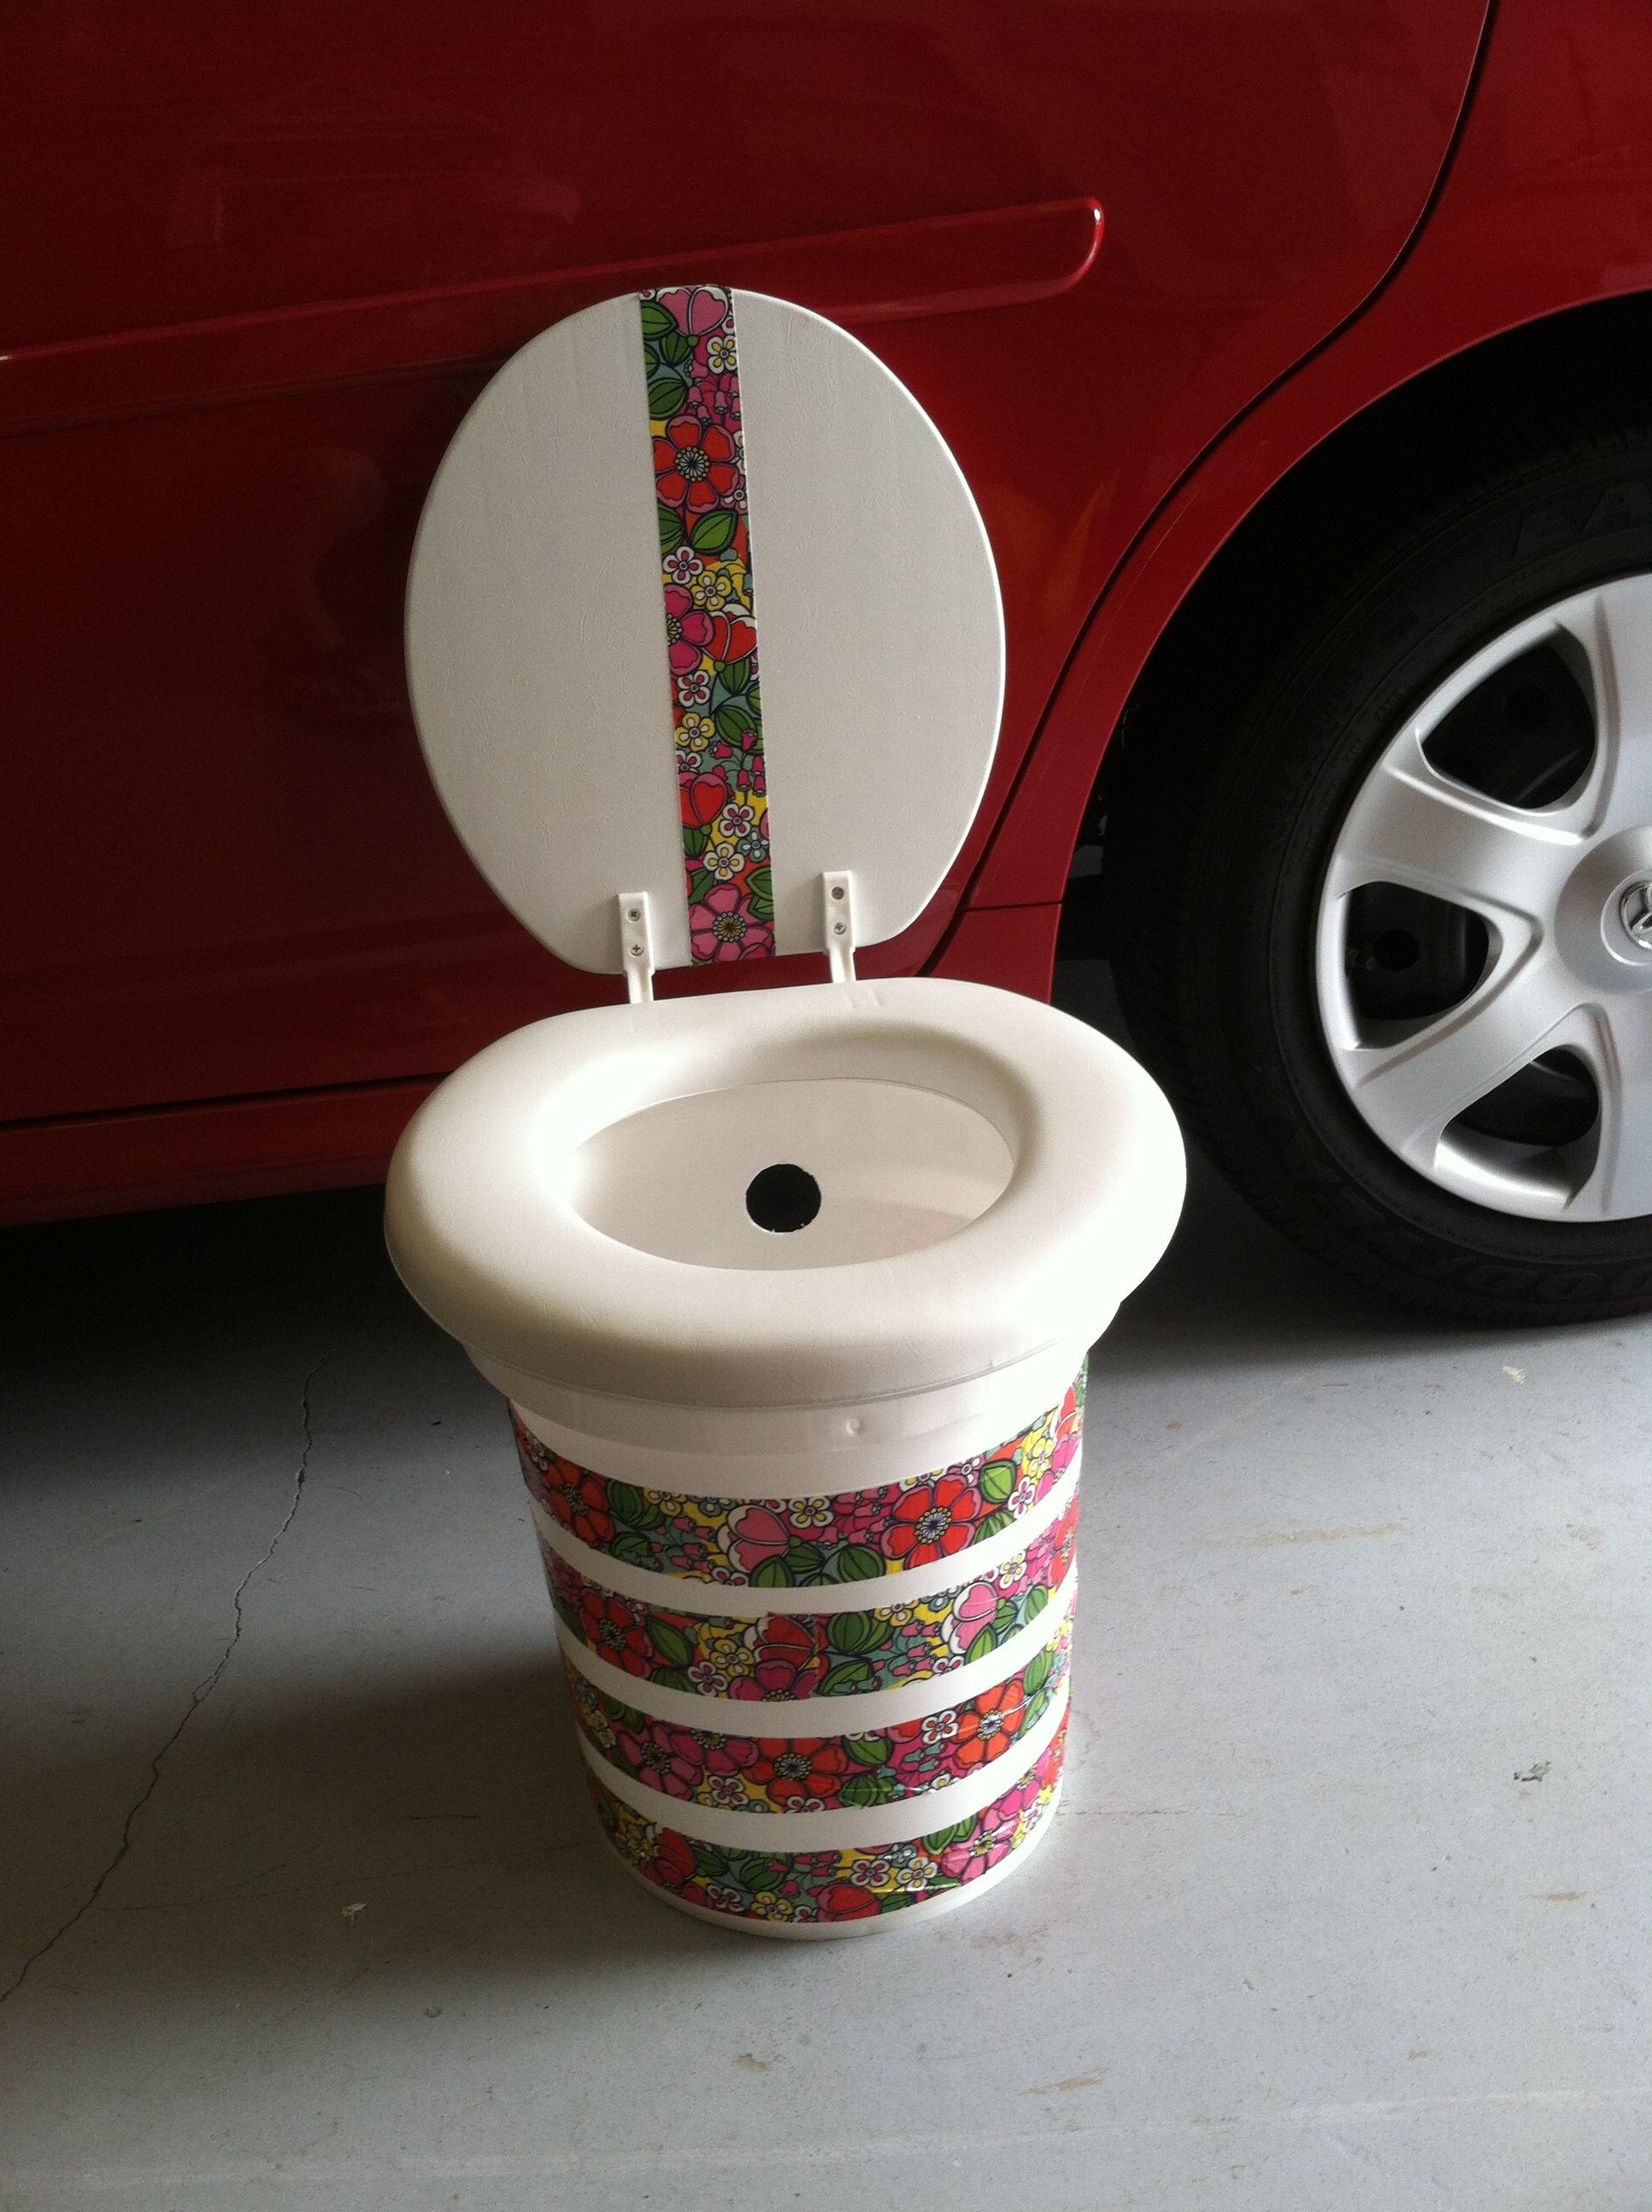 departments decor lupa silver effect at seat cooke diy lewis b glitter prd seats bq toilet q decorative